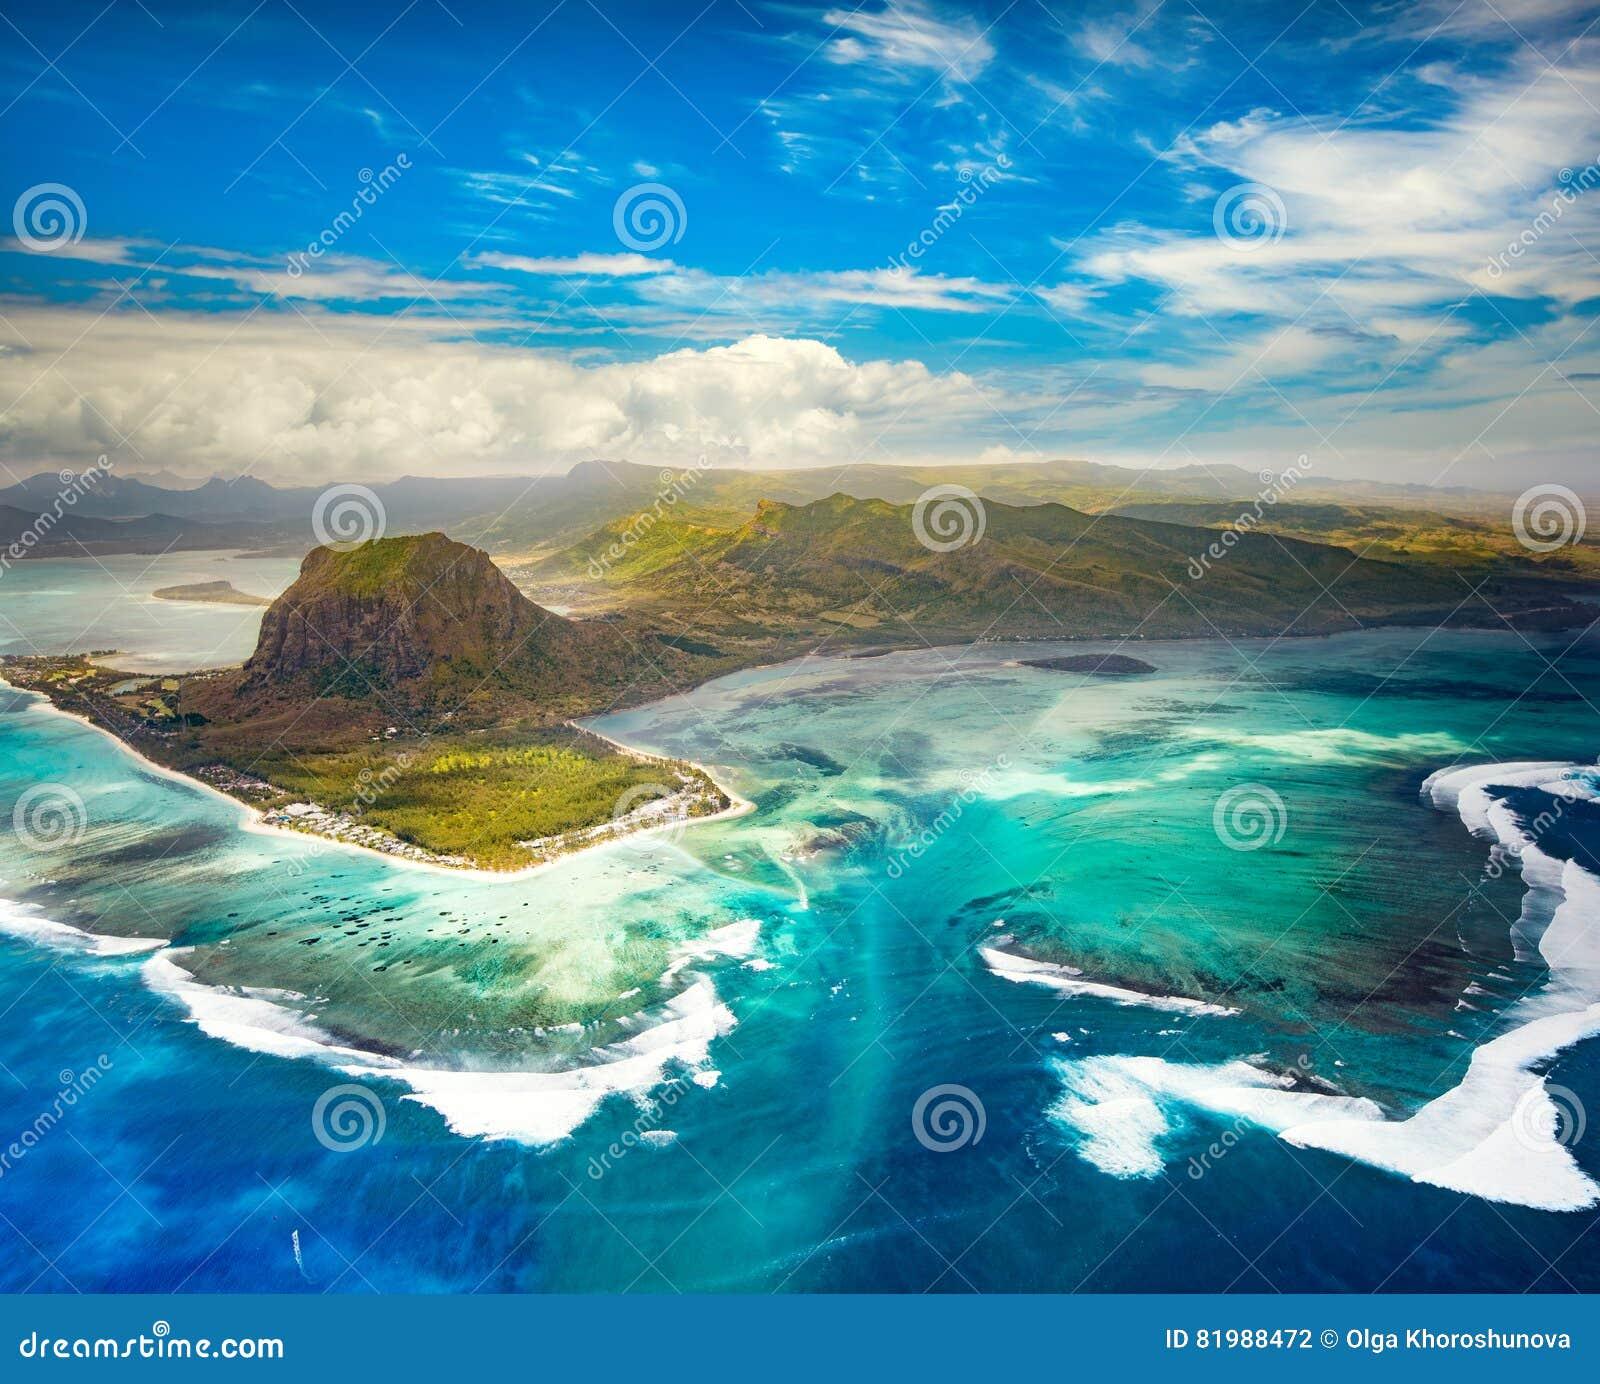 Aerial view of the underwater waterfall. Mauritius